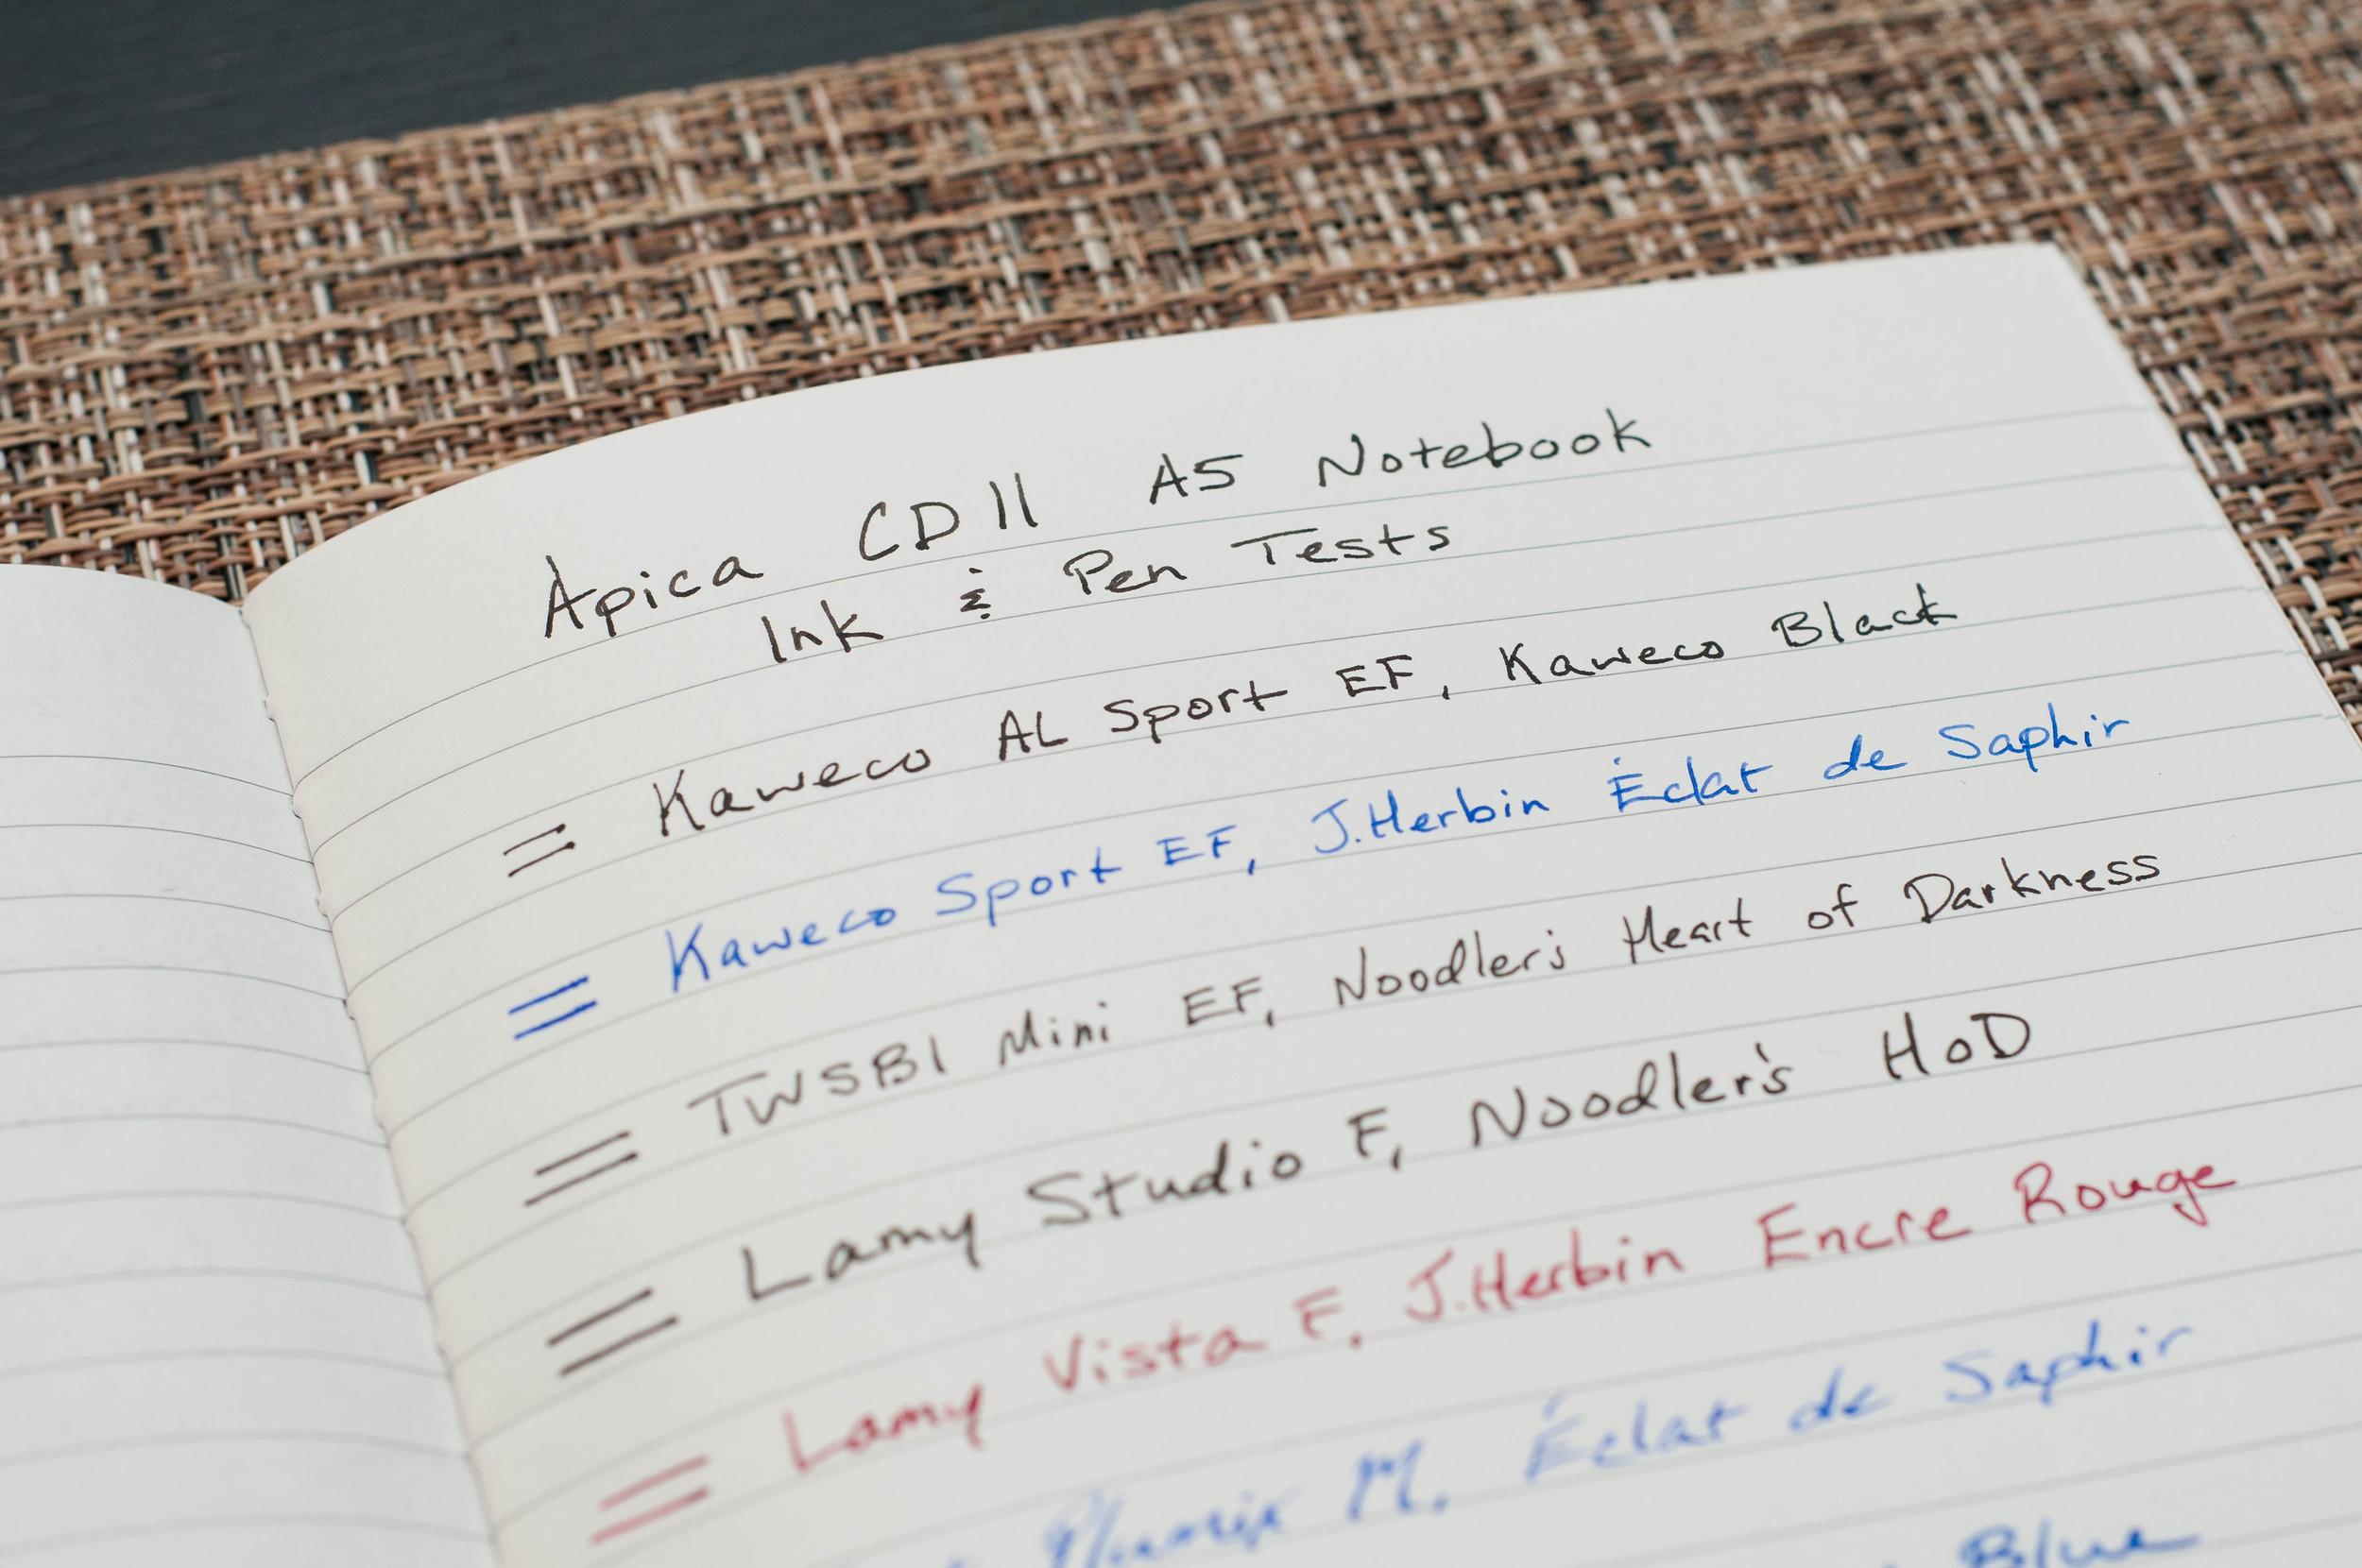 Apica CD Notebook Ink Test.jpg